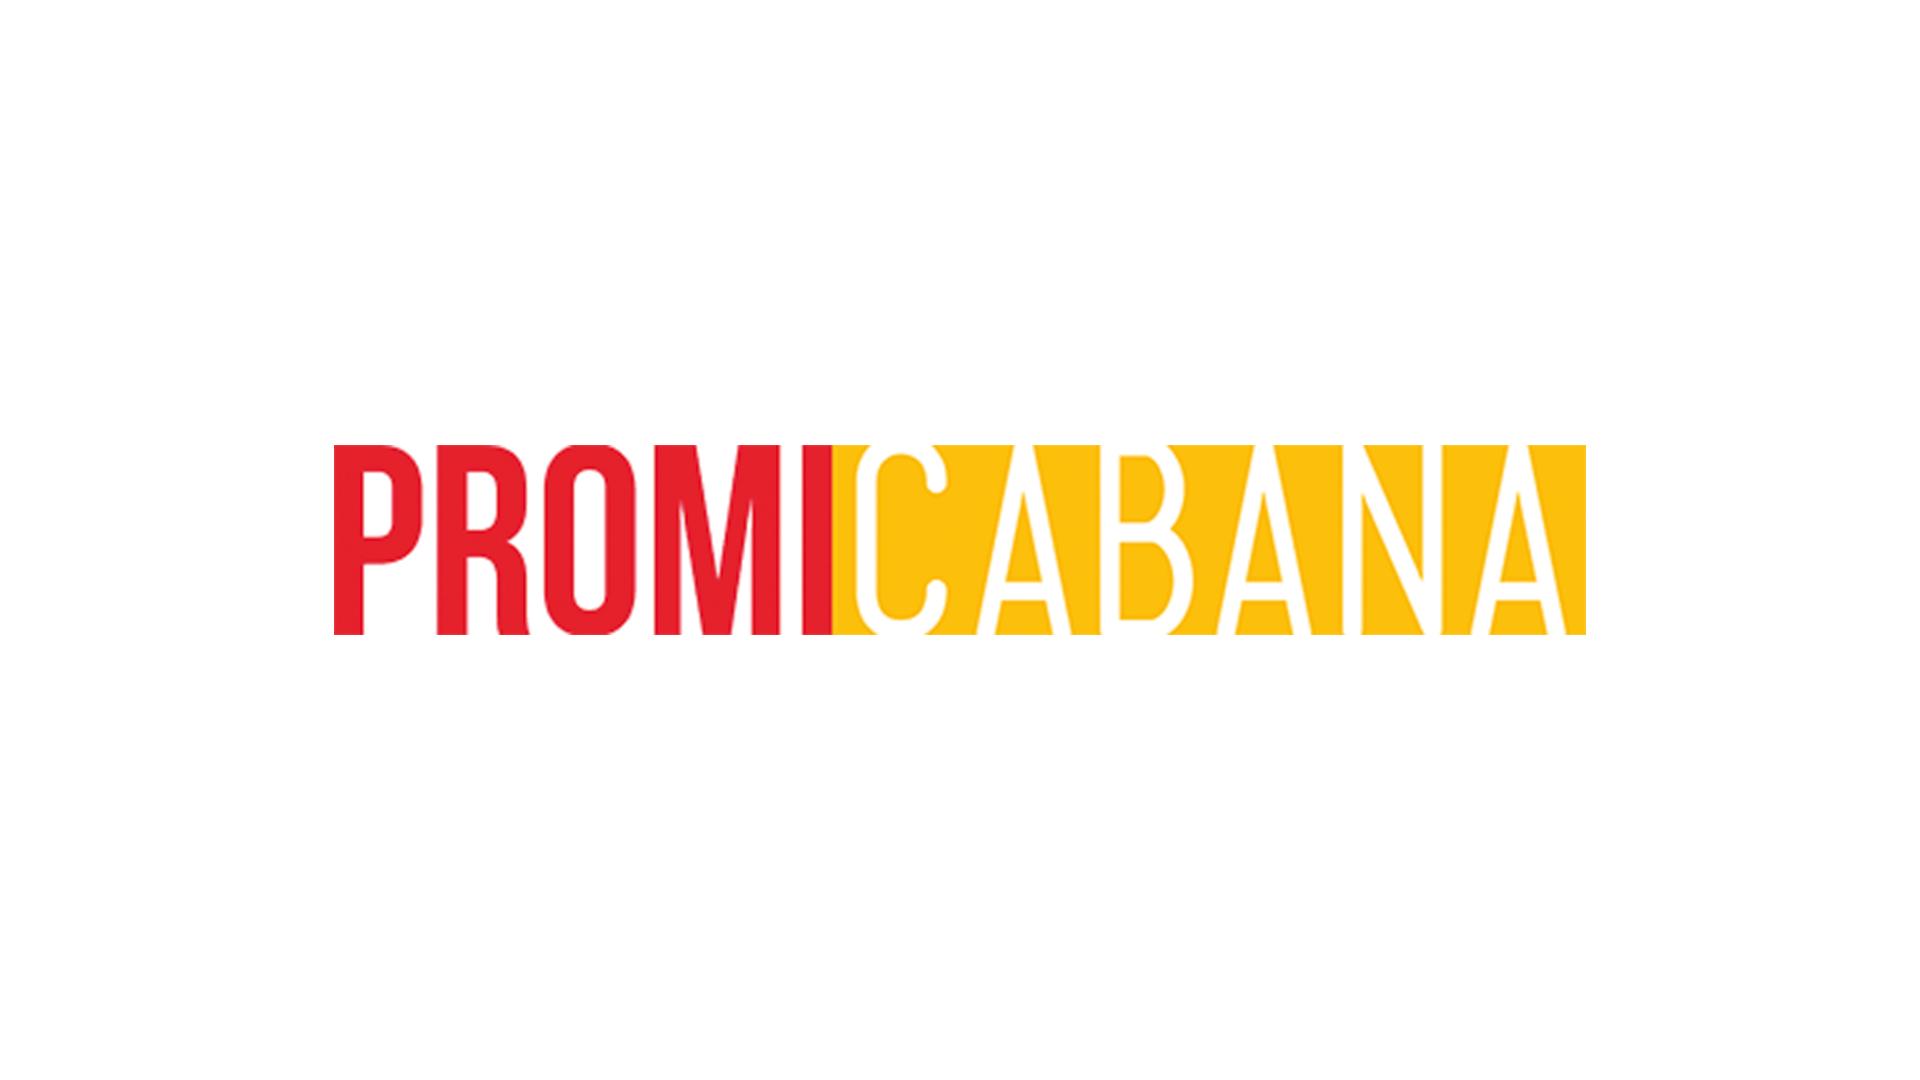 Chris-Brown-Gericht-Feb-2013